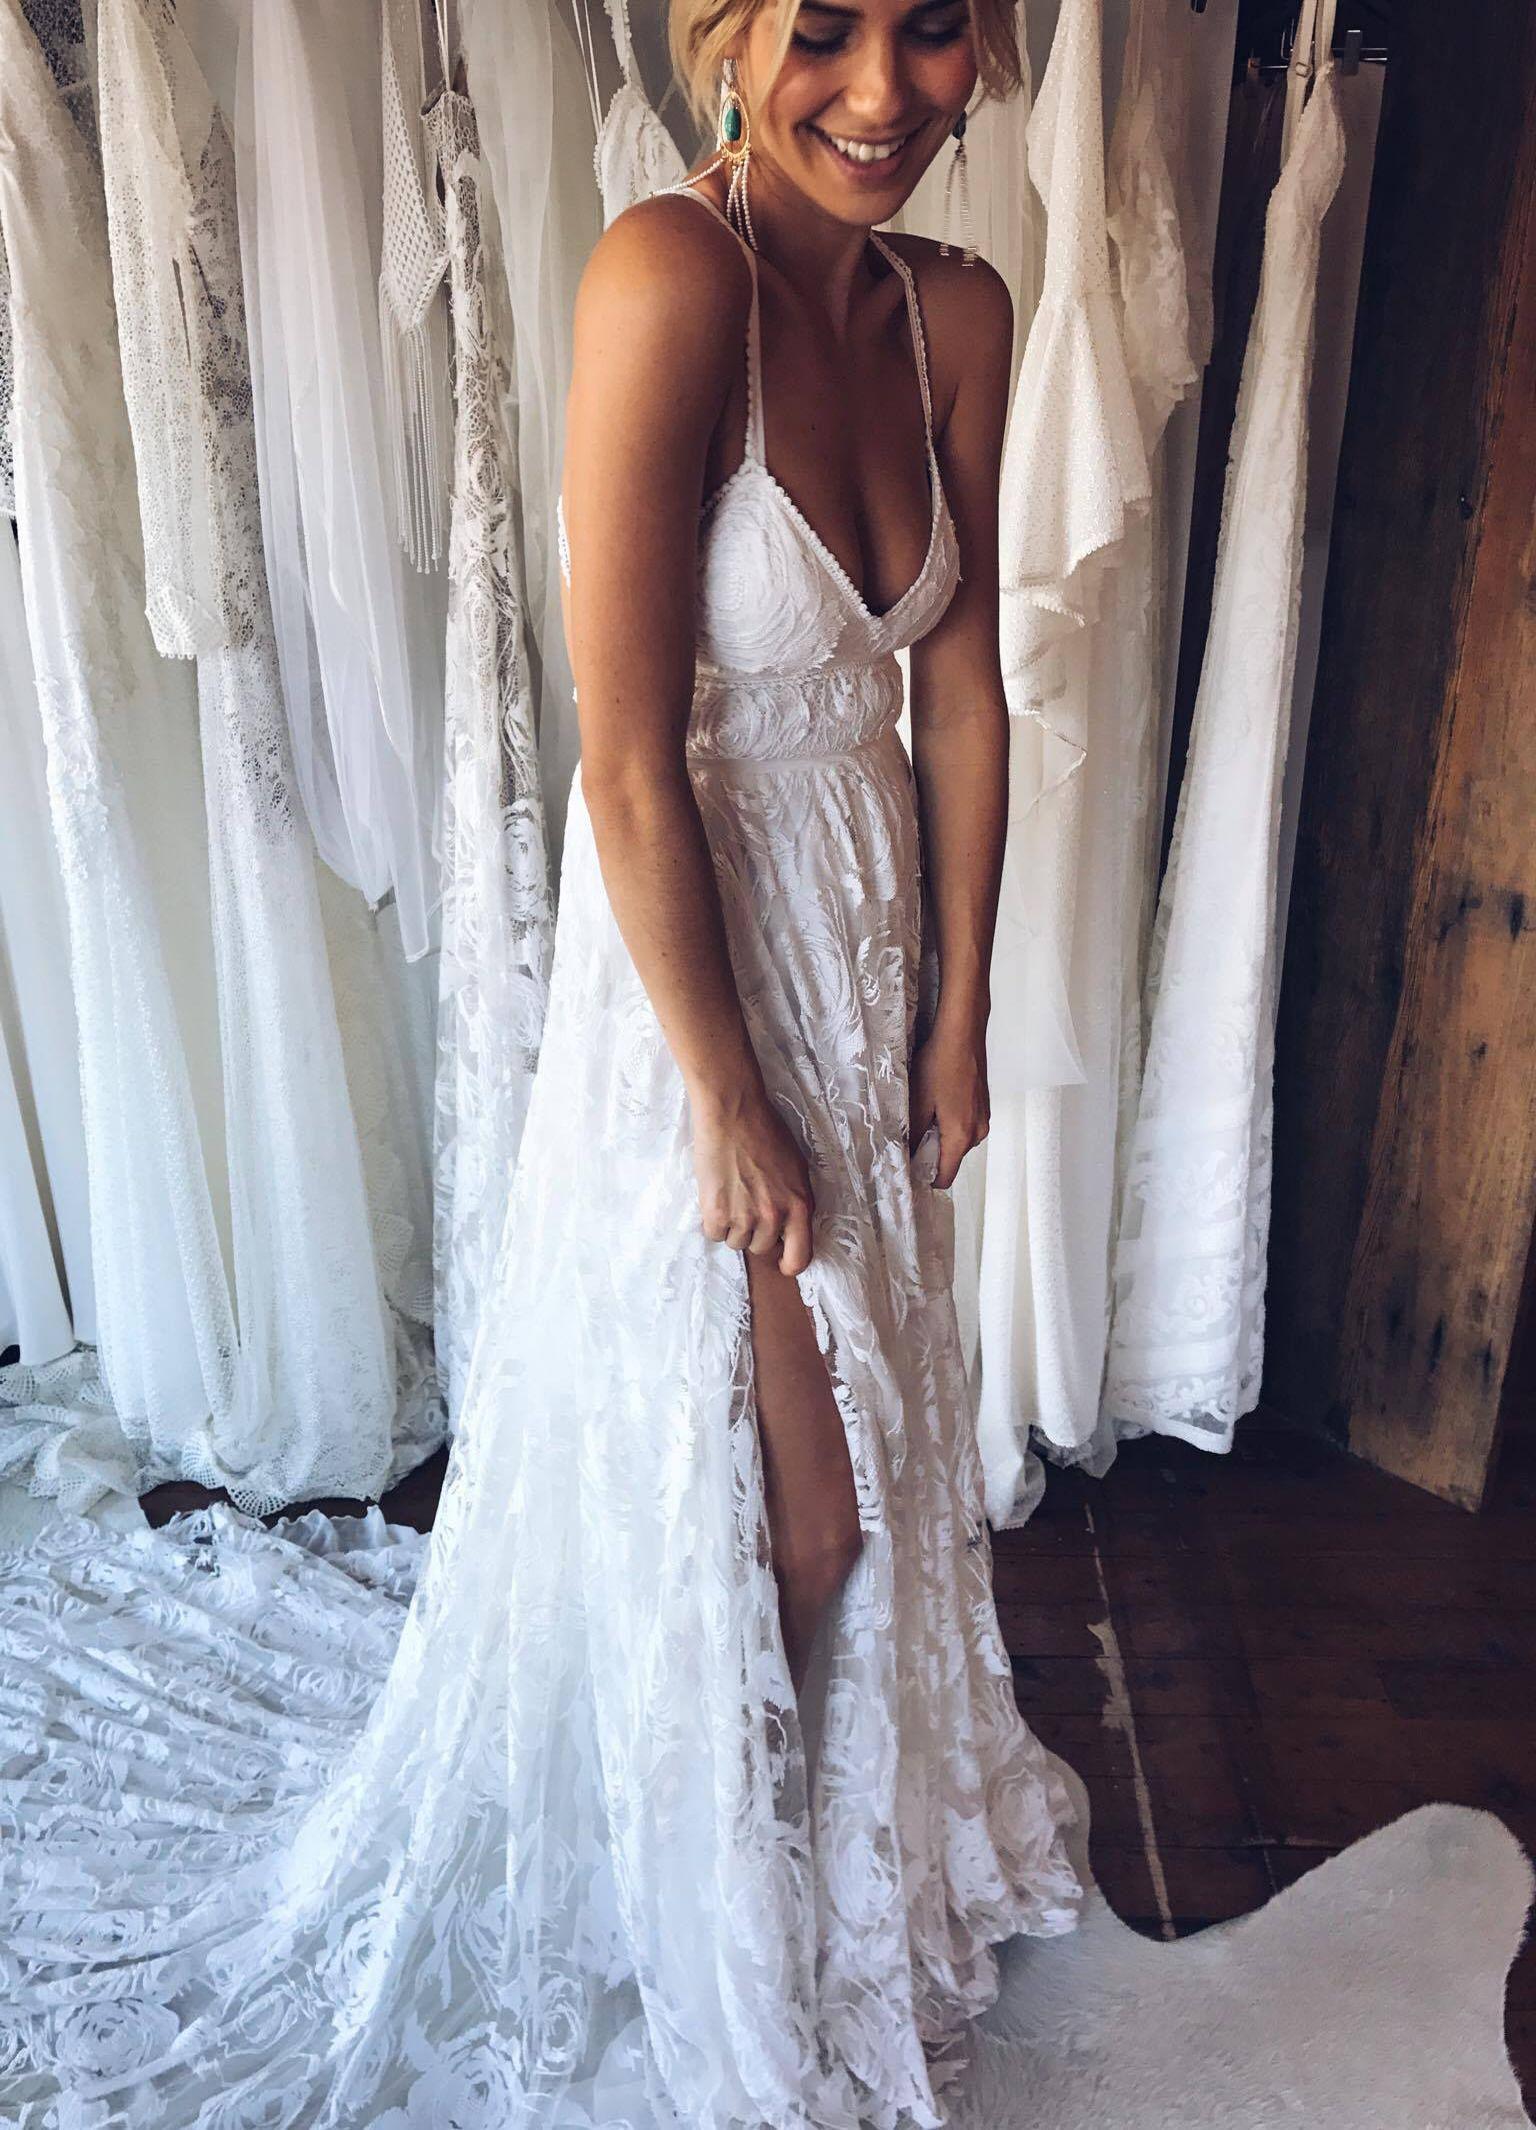 Sexy Spaghetti Straps Wedding Dresses V Neck High Low Open Back A Line Sleeveless Satin Reception Bridal Dress Vestido De Noiva Demand Exceeding Supply Weddings & Events